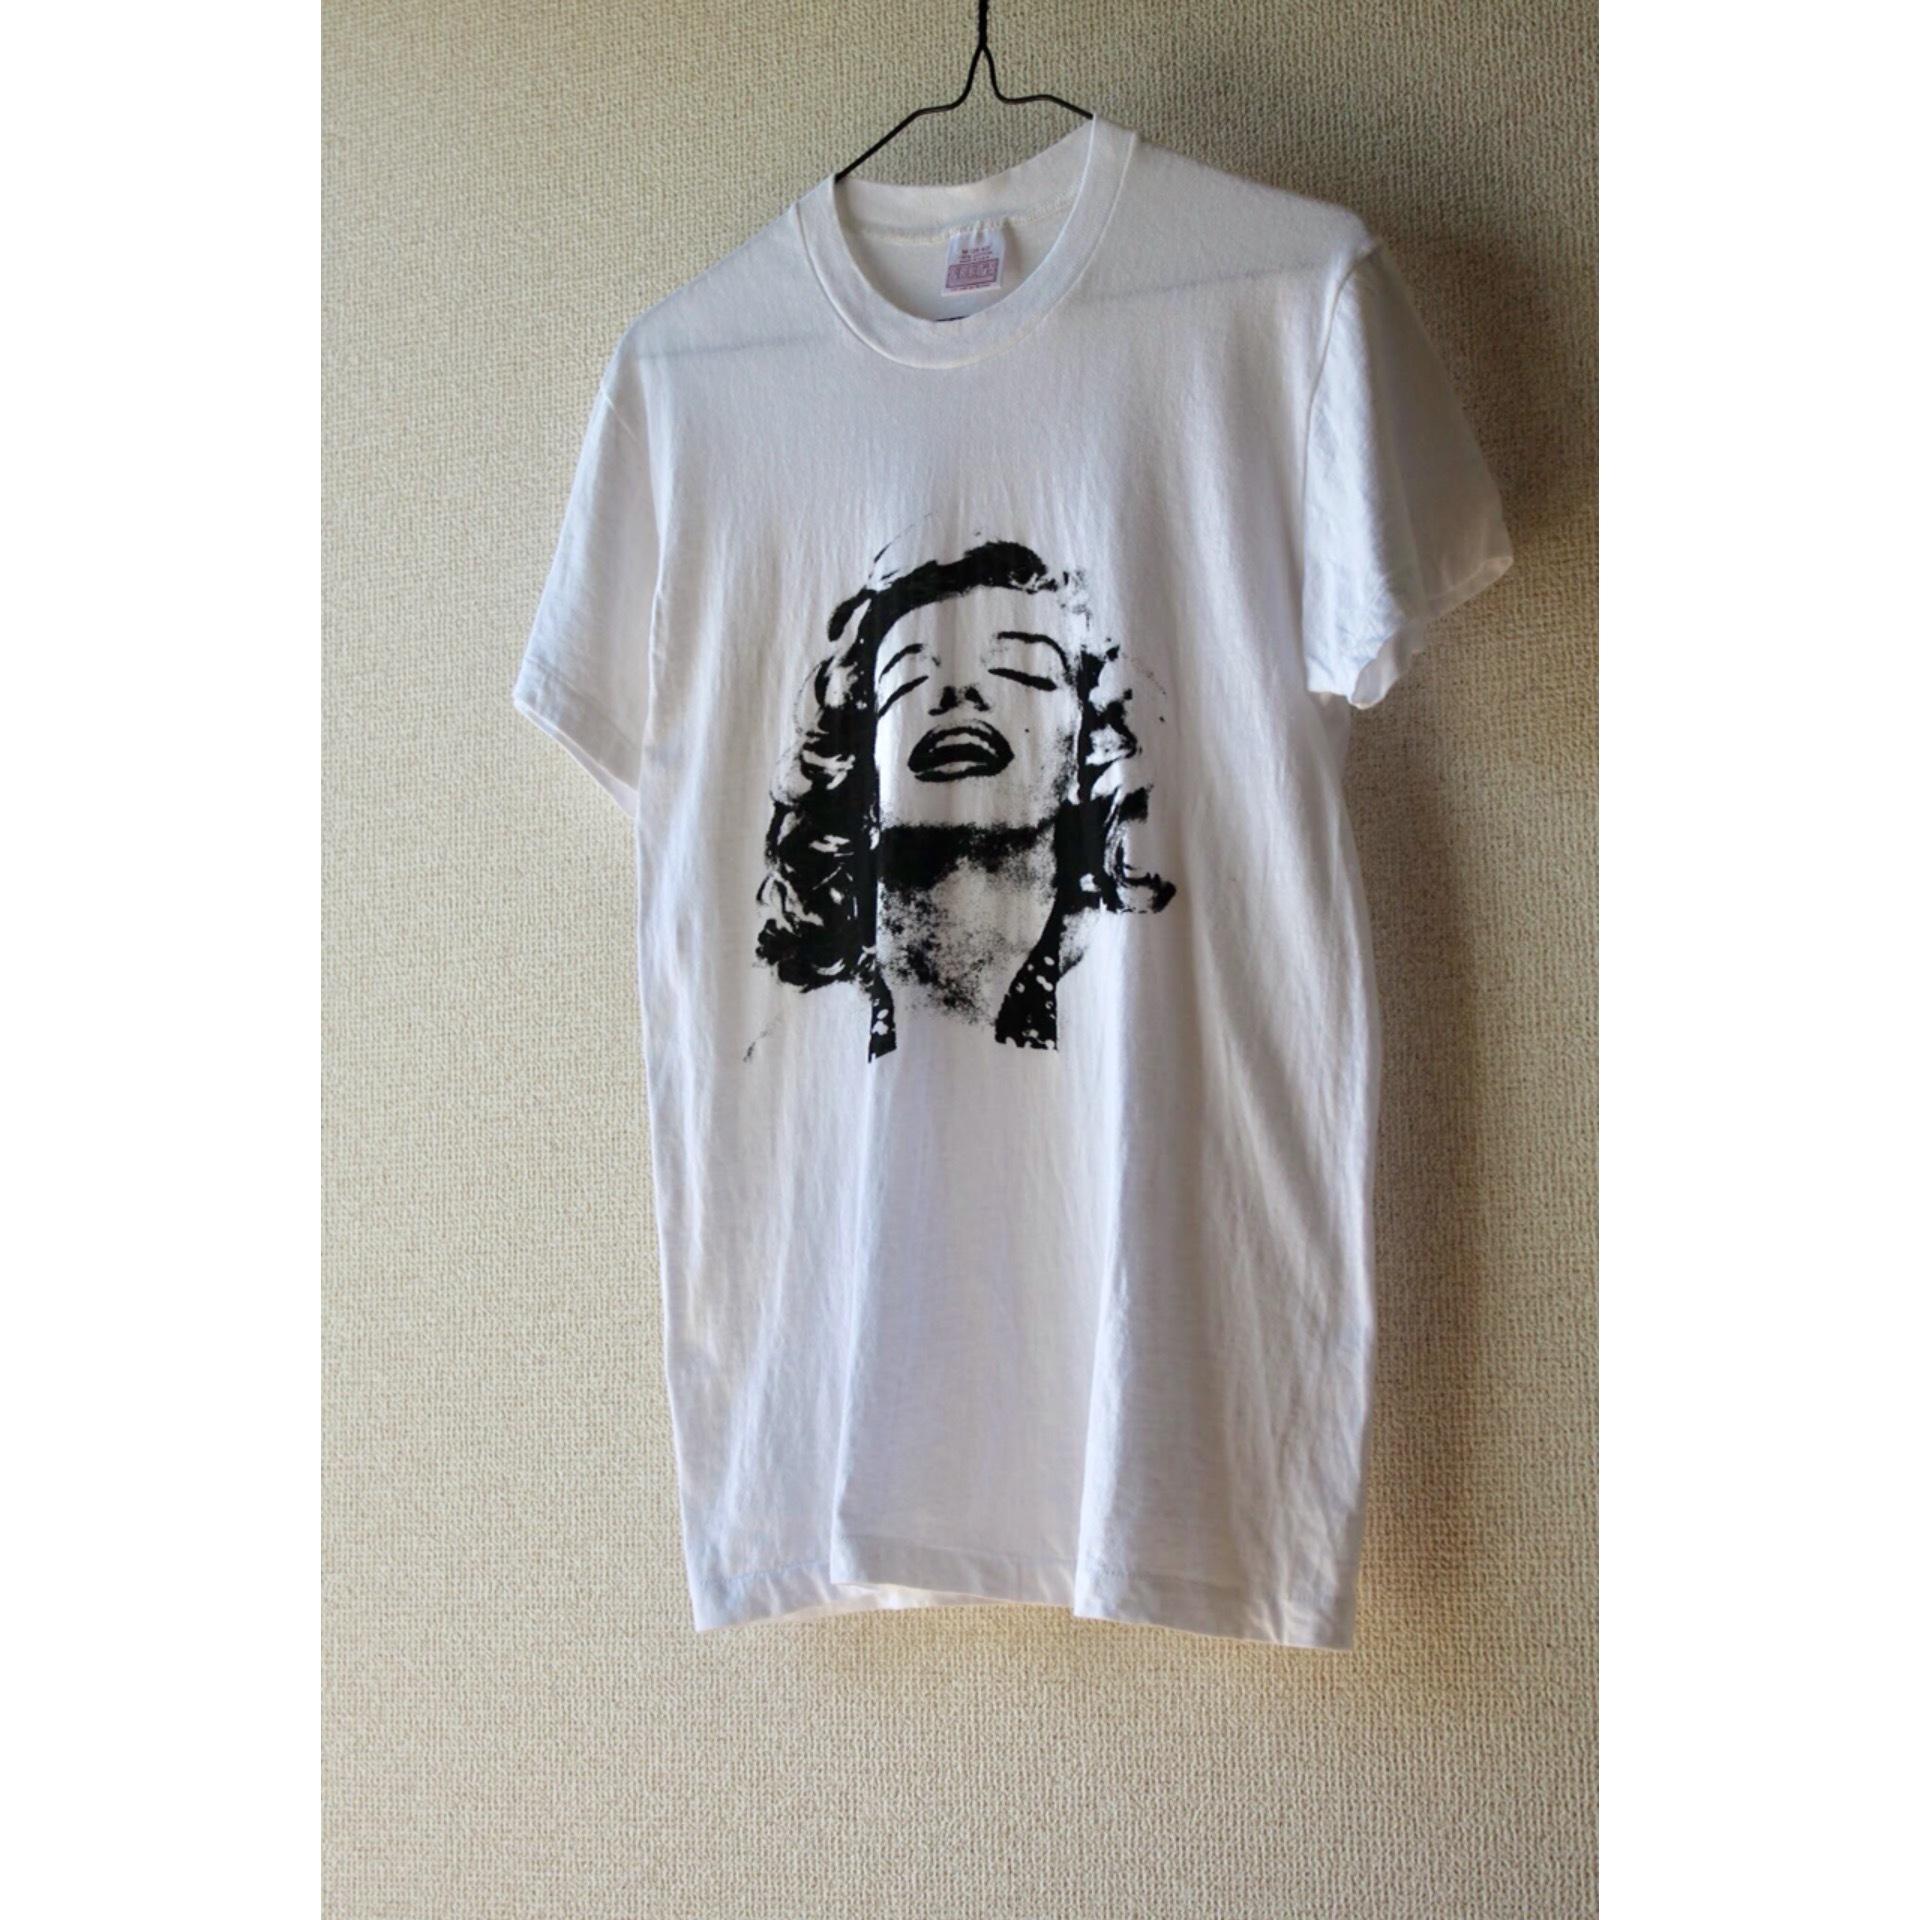 80s Marilyn Monroe t shirt